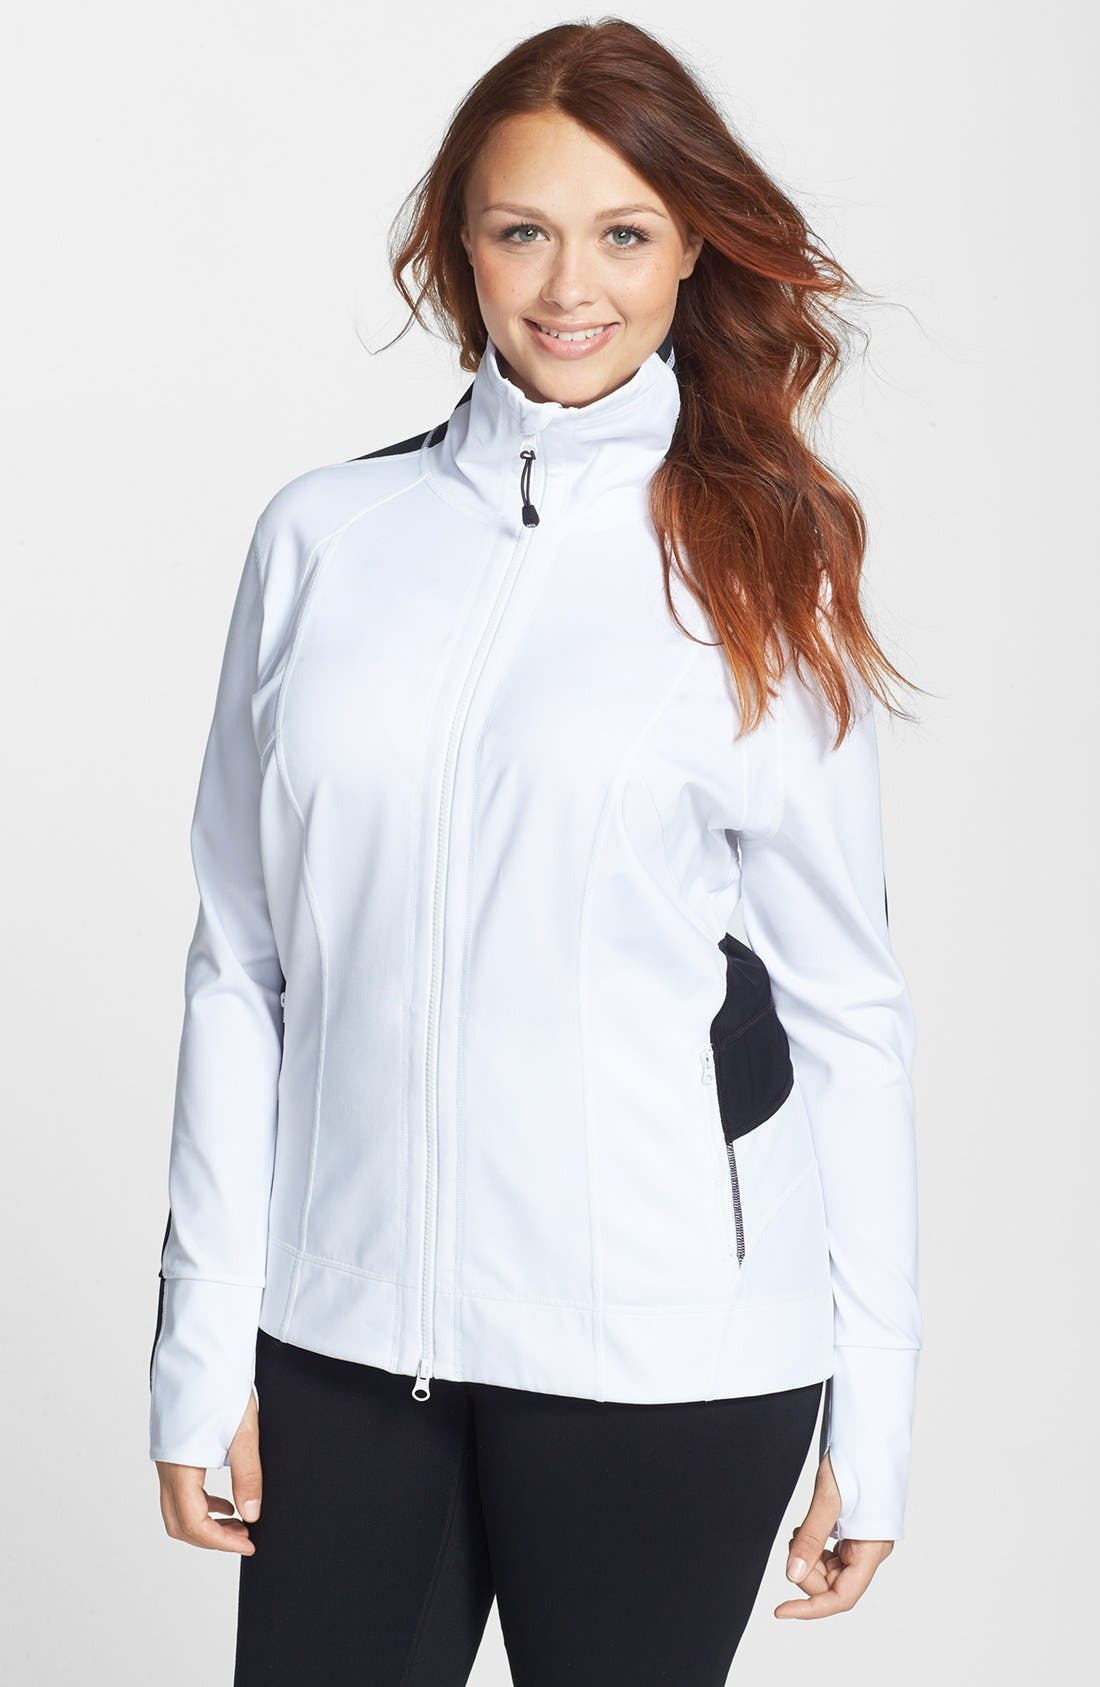 Alternate Image 1 Selected - Zella 'Bliss' Colorblock Jacket (Plus Size)